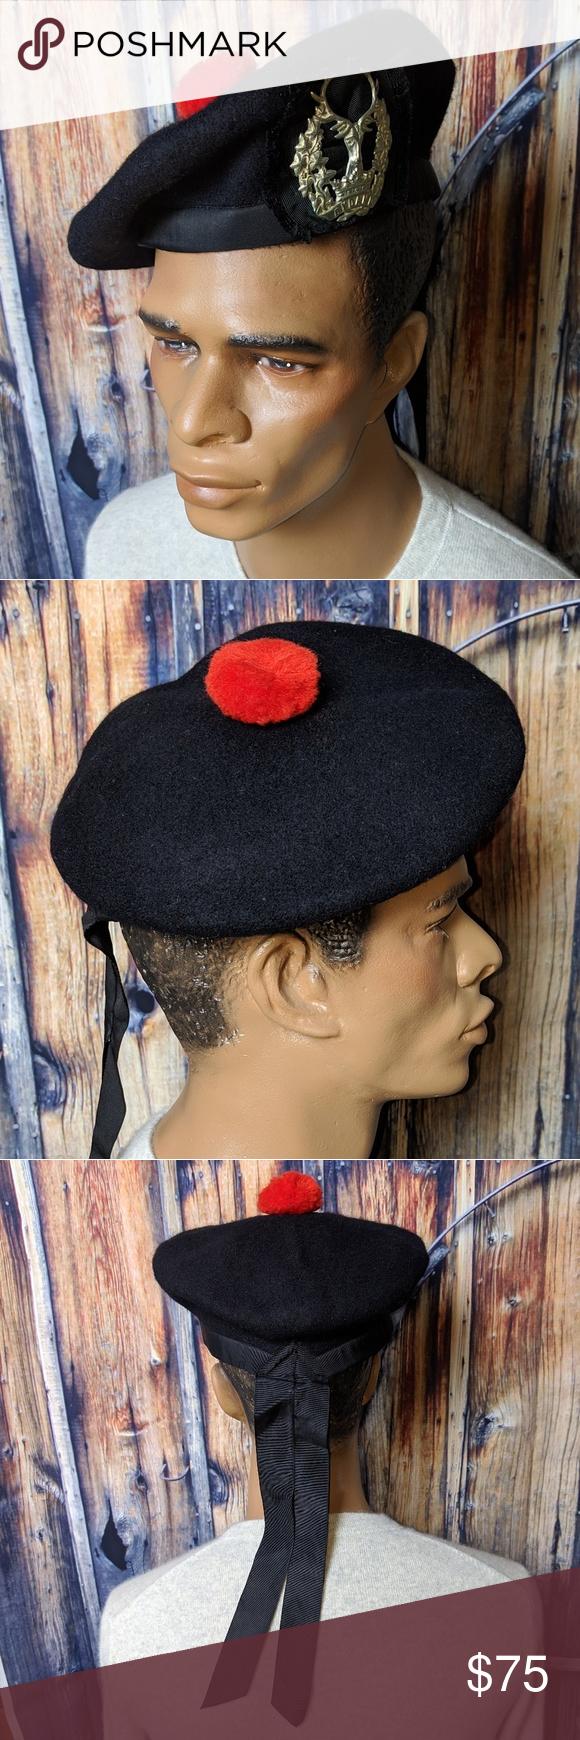 Gordon Highlanders black tam-o-shanter hat WWII World War II